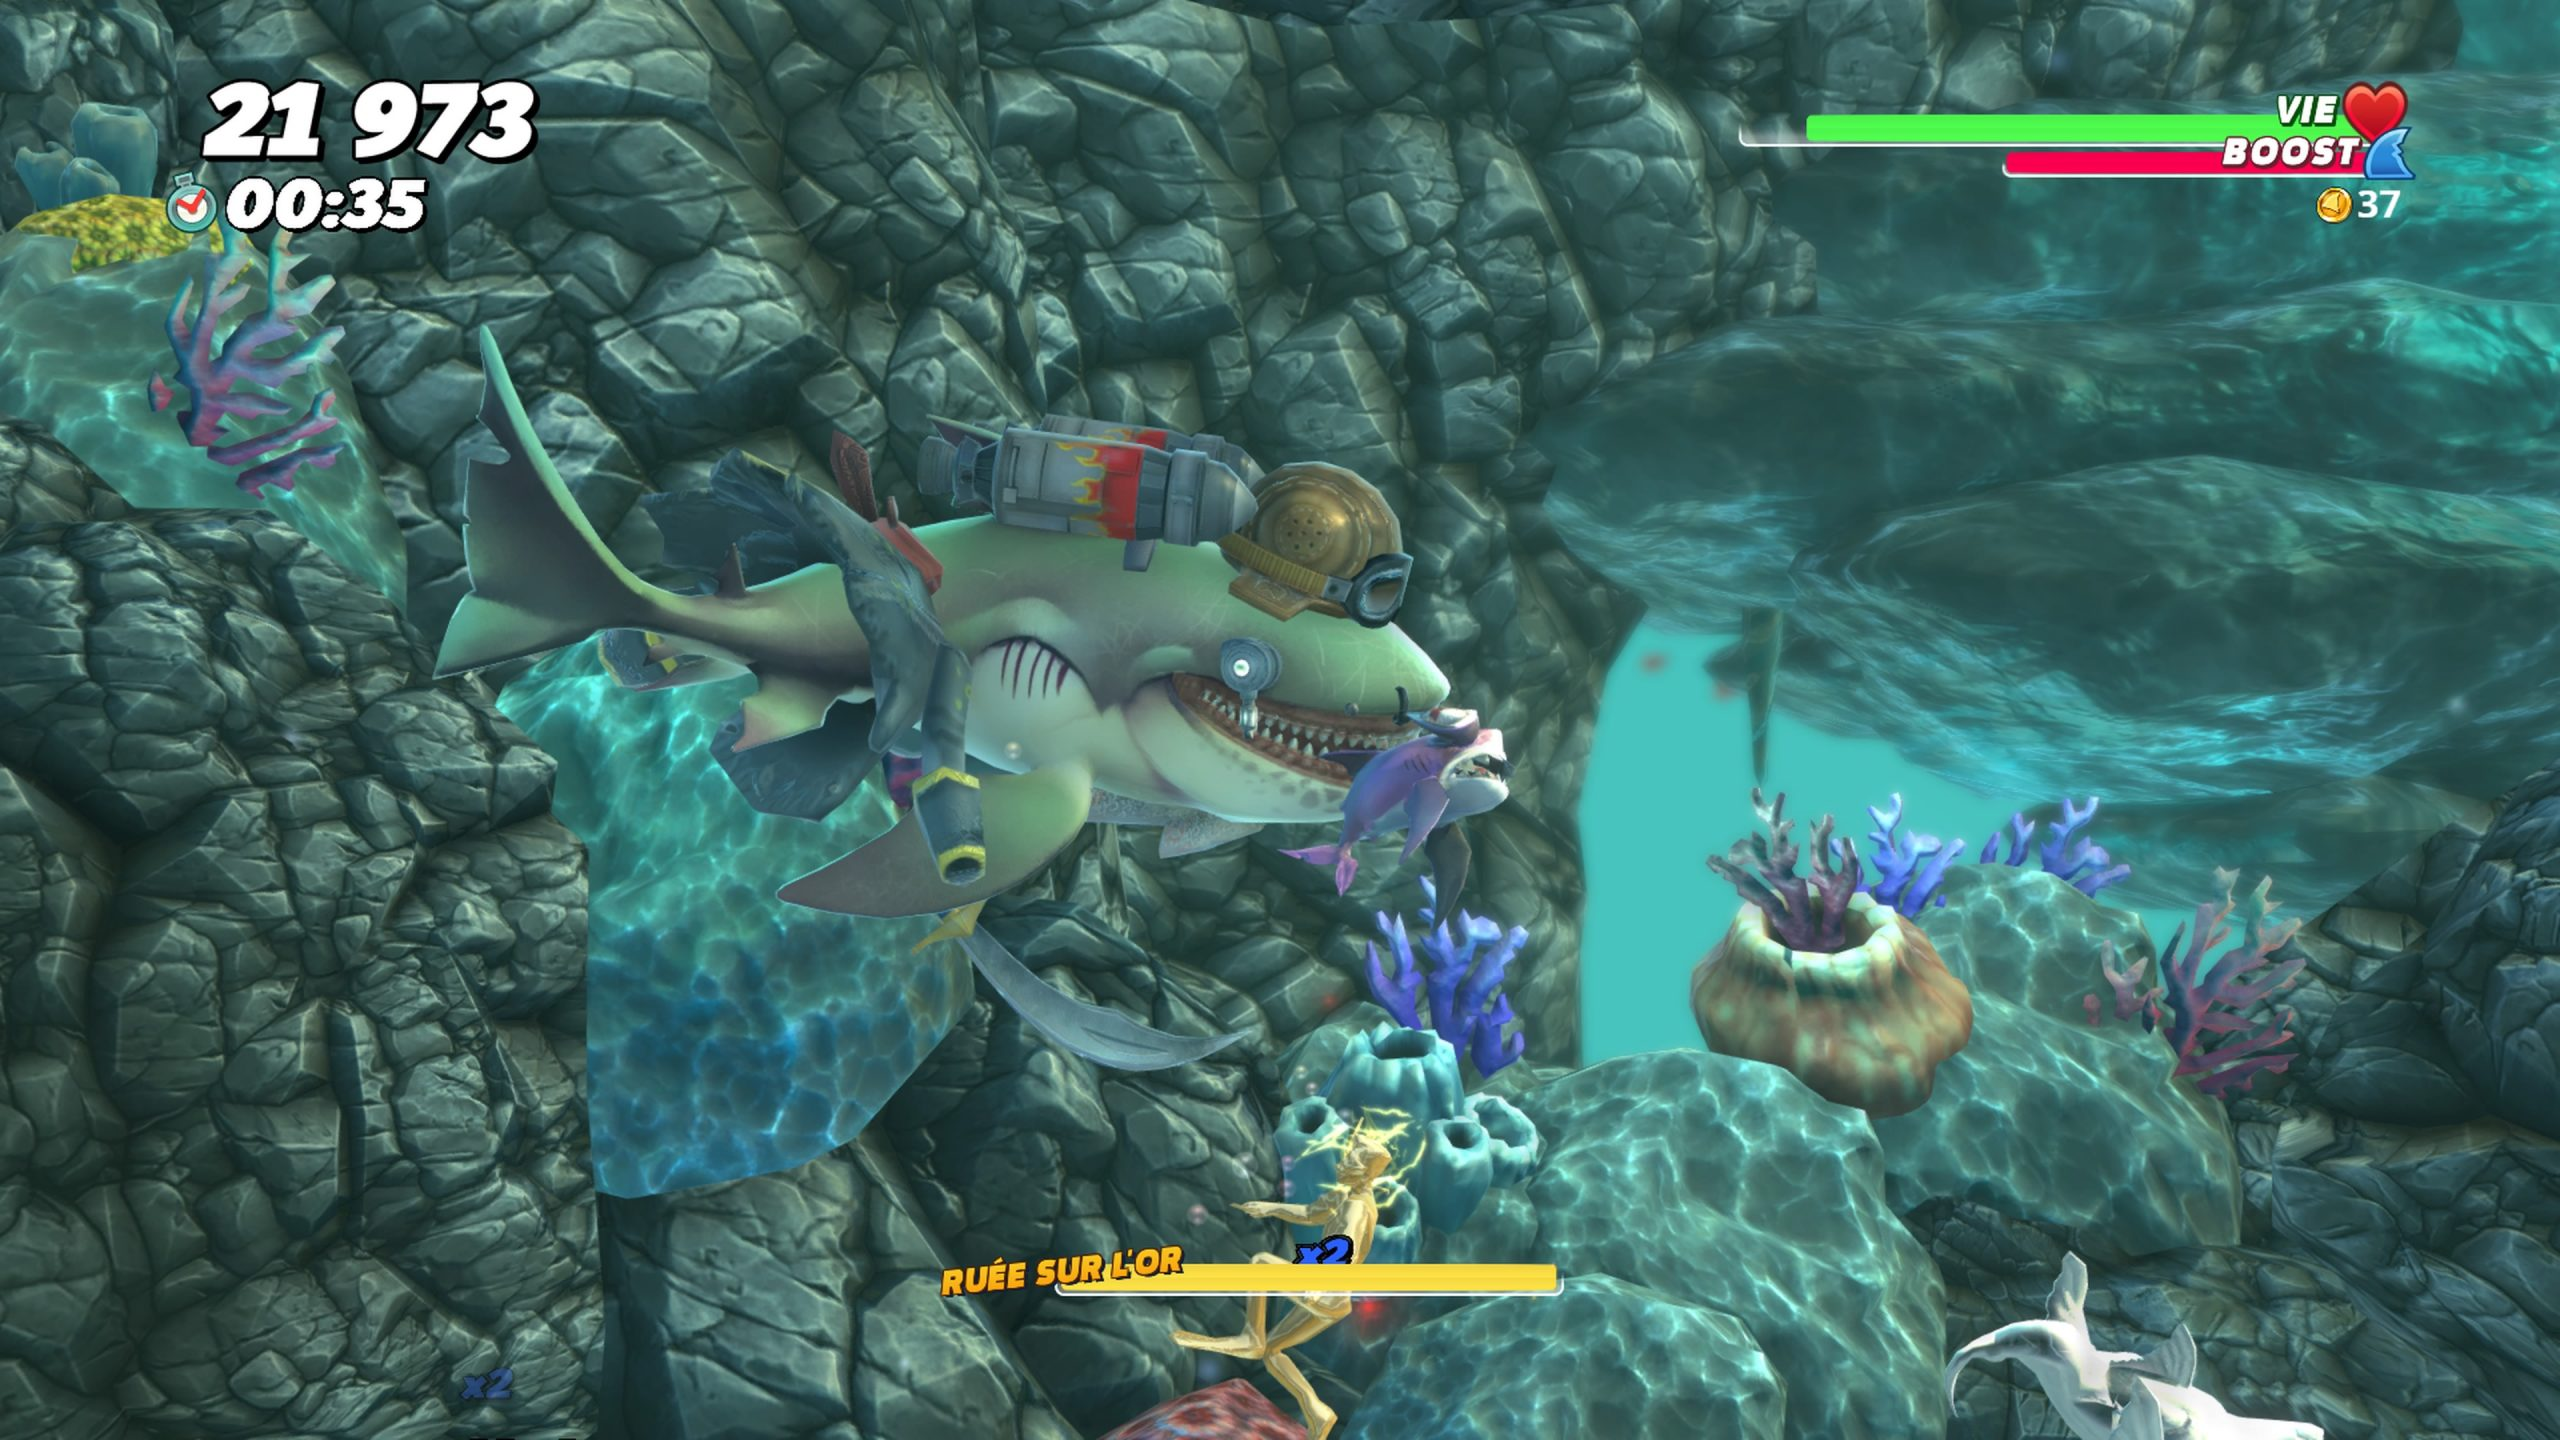 Test De Hungry Shark World - Baignade Interdite ? @jvl encequiconcerne Requin Jeux Video